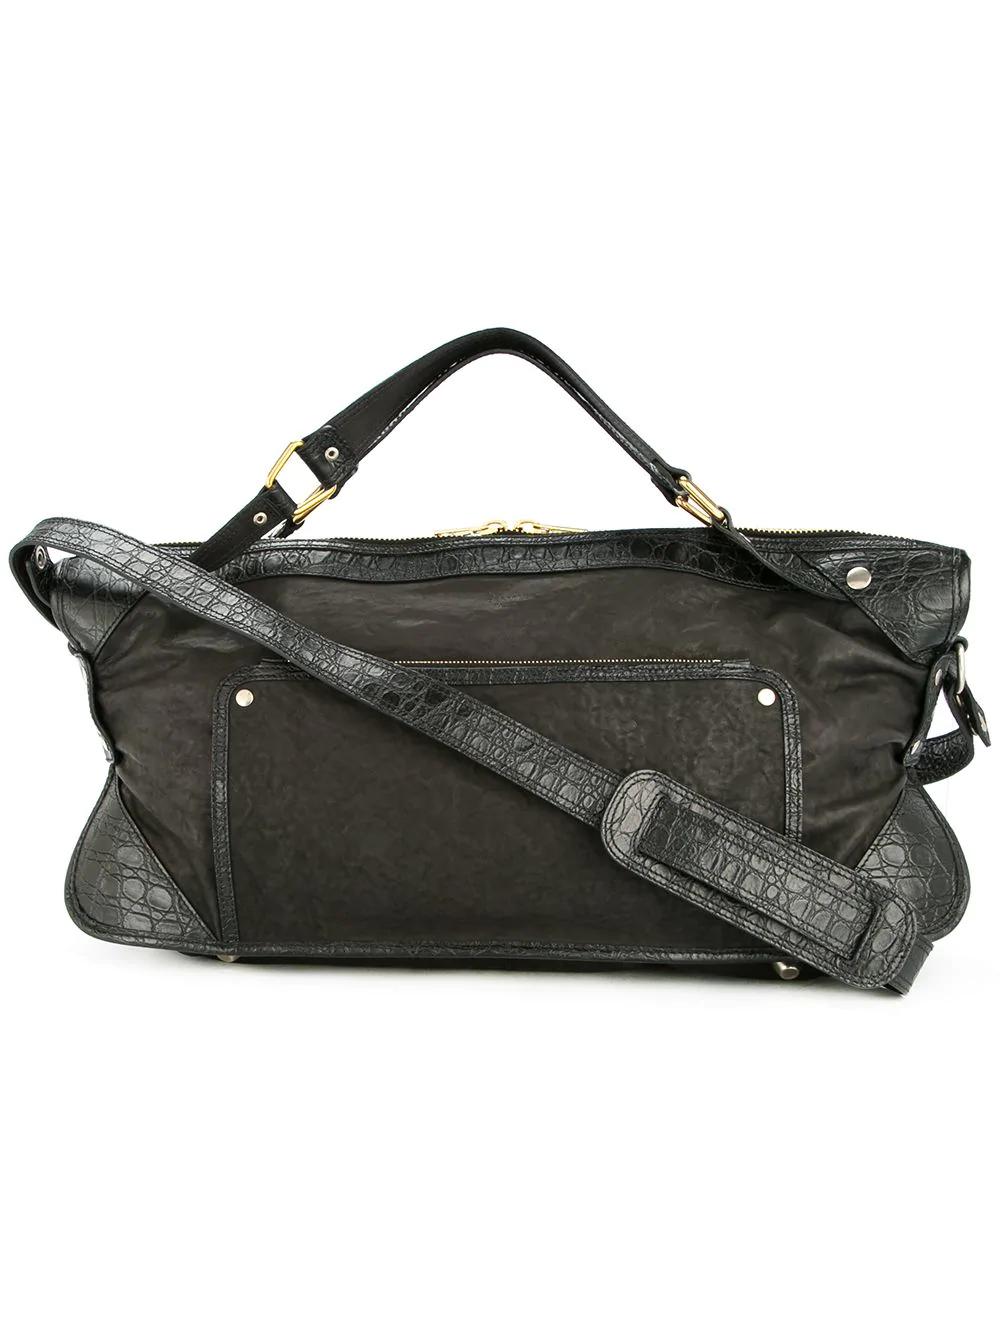 88d72d5f2772 Celine CÉLine Vintage Logos 2Way Hand Bag - Black